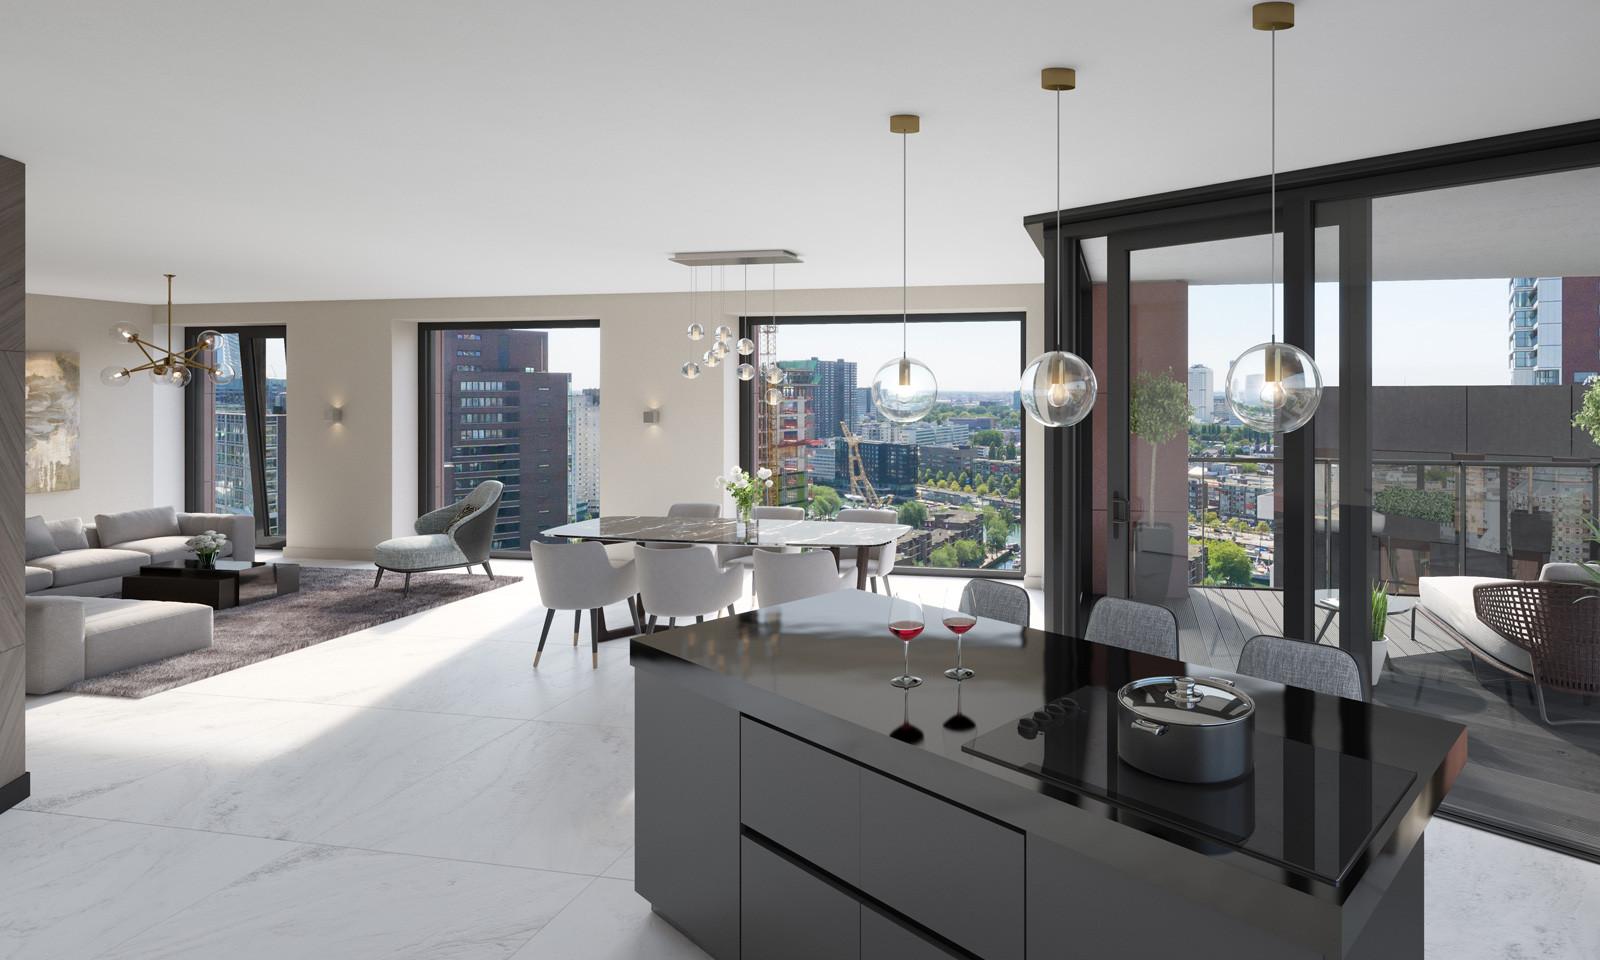 torenappartement_3